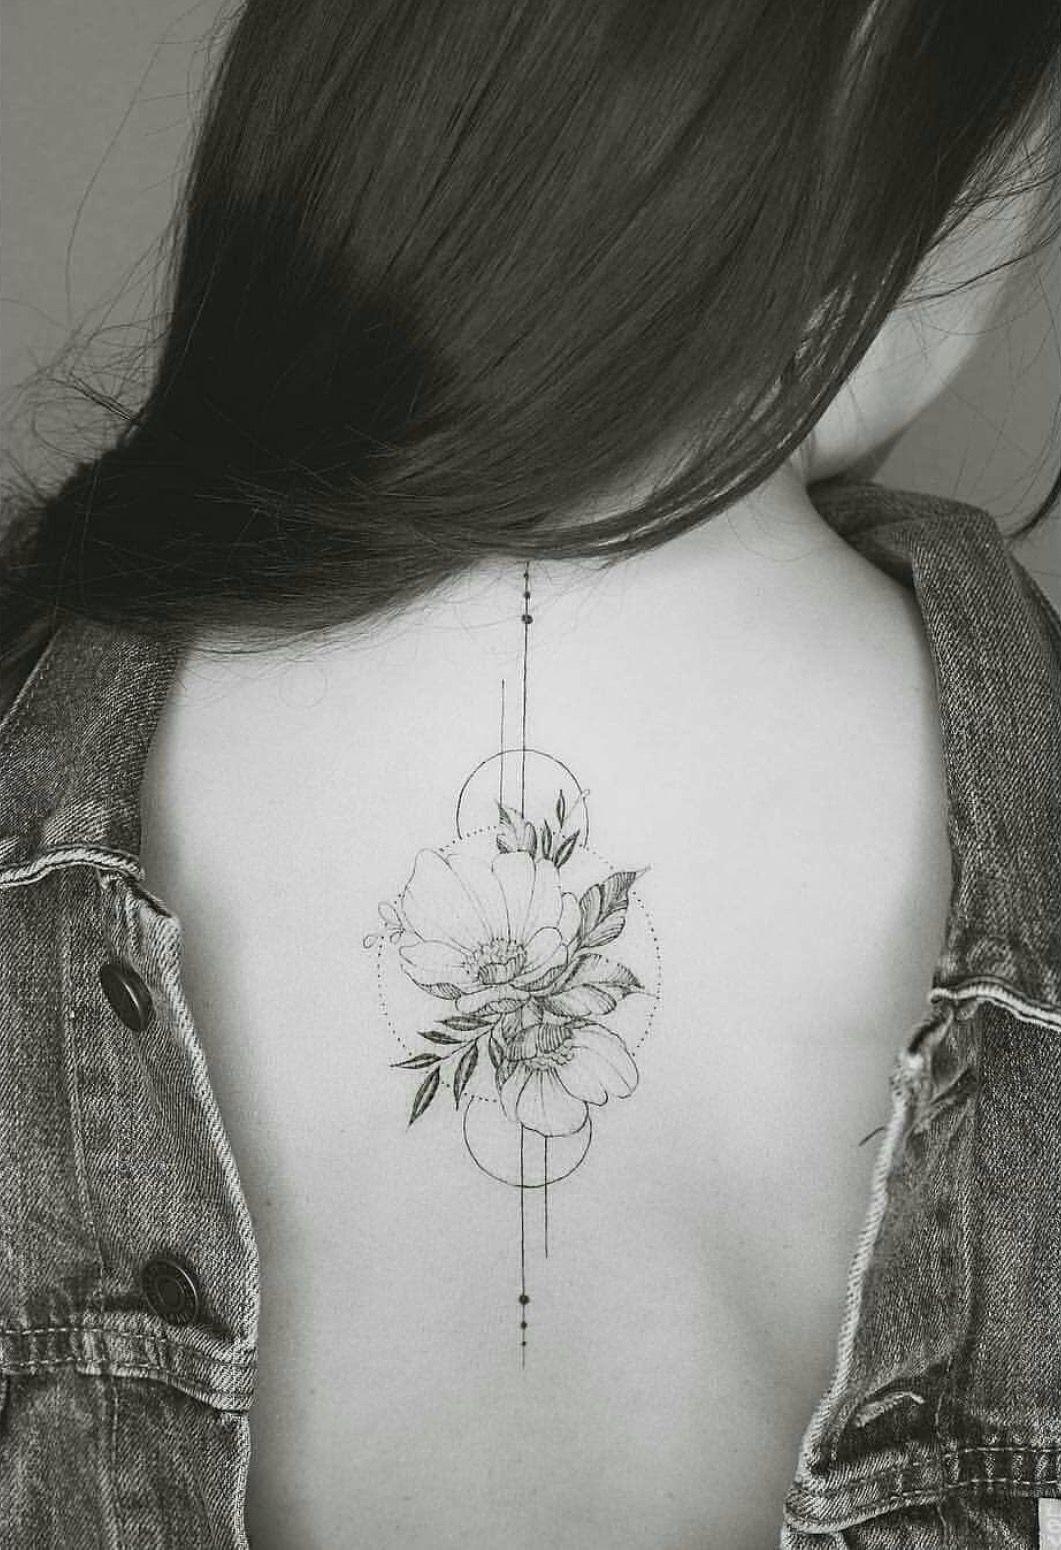 épinglé Sur Tattooinspiration